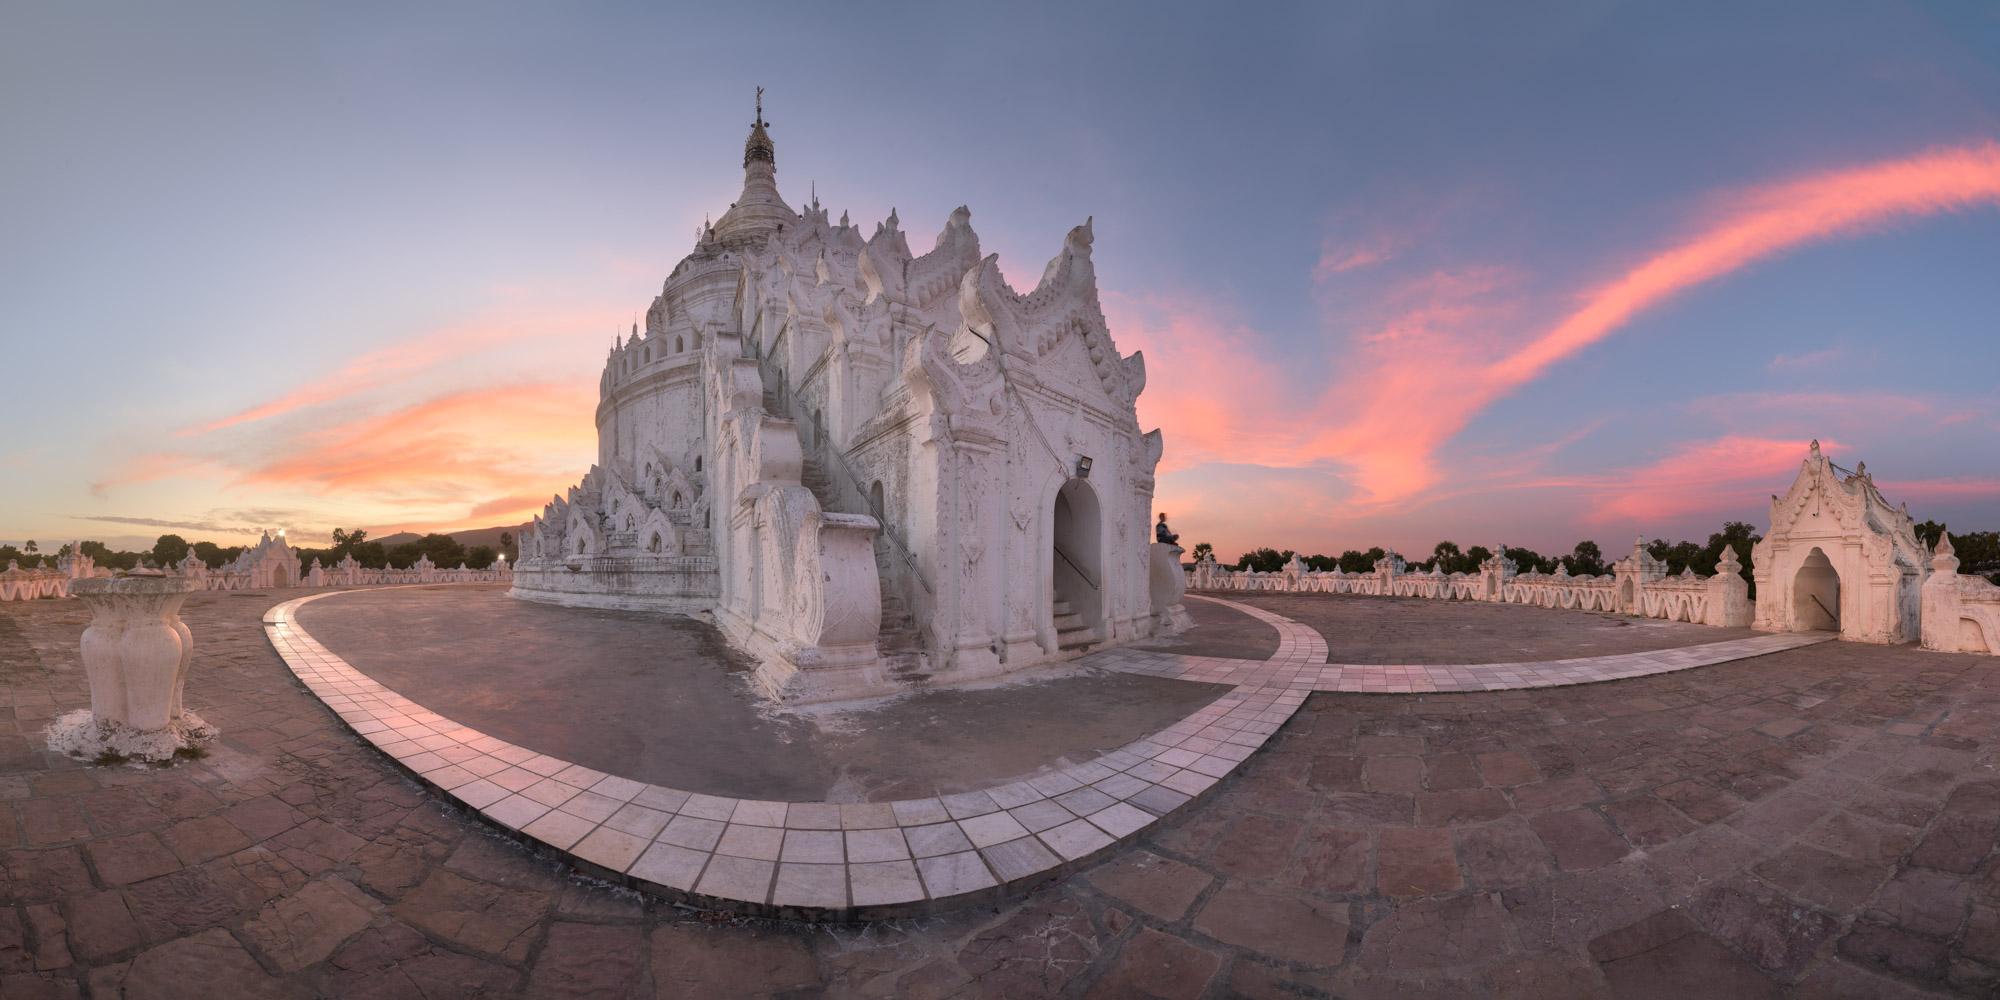 Mya Thein Tan Pagoda in Mingun, Myanmar